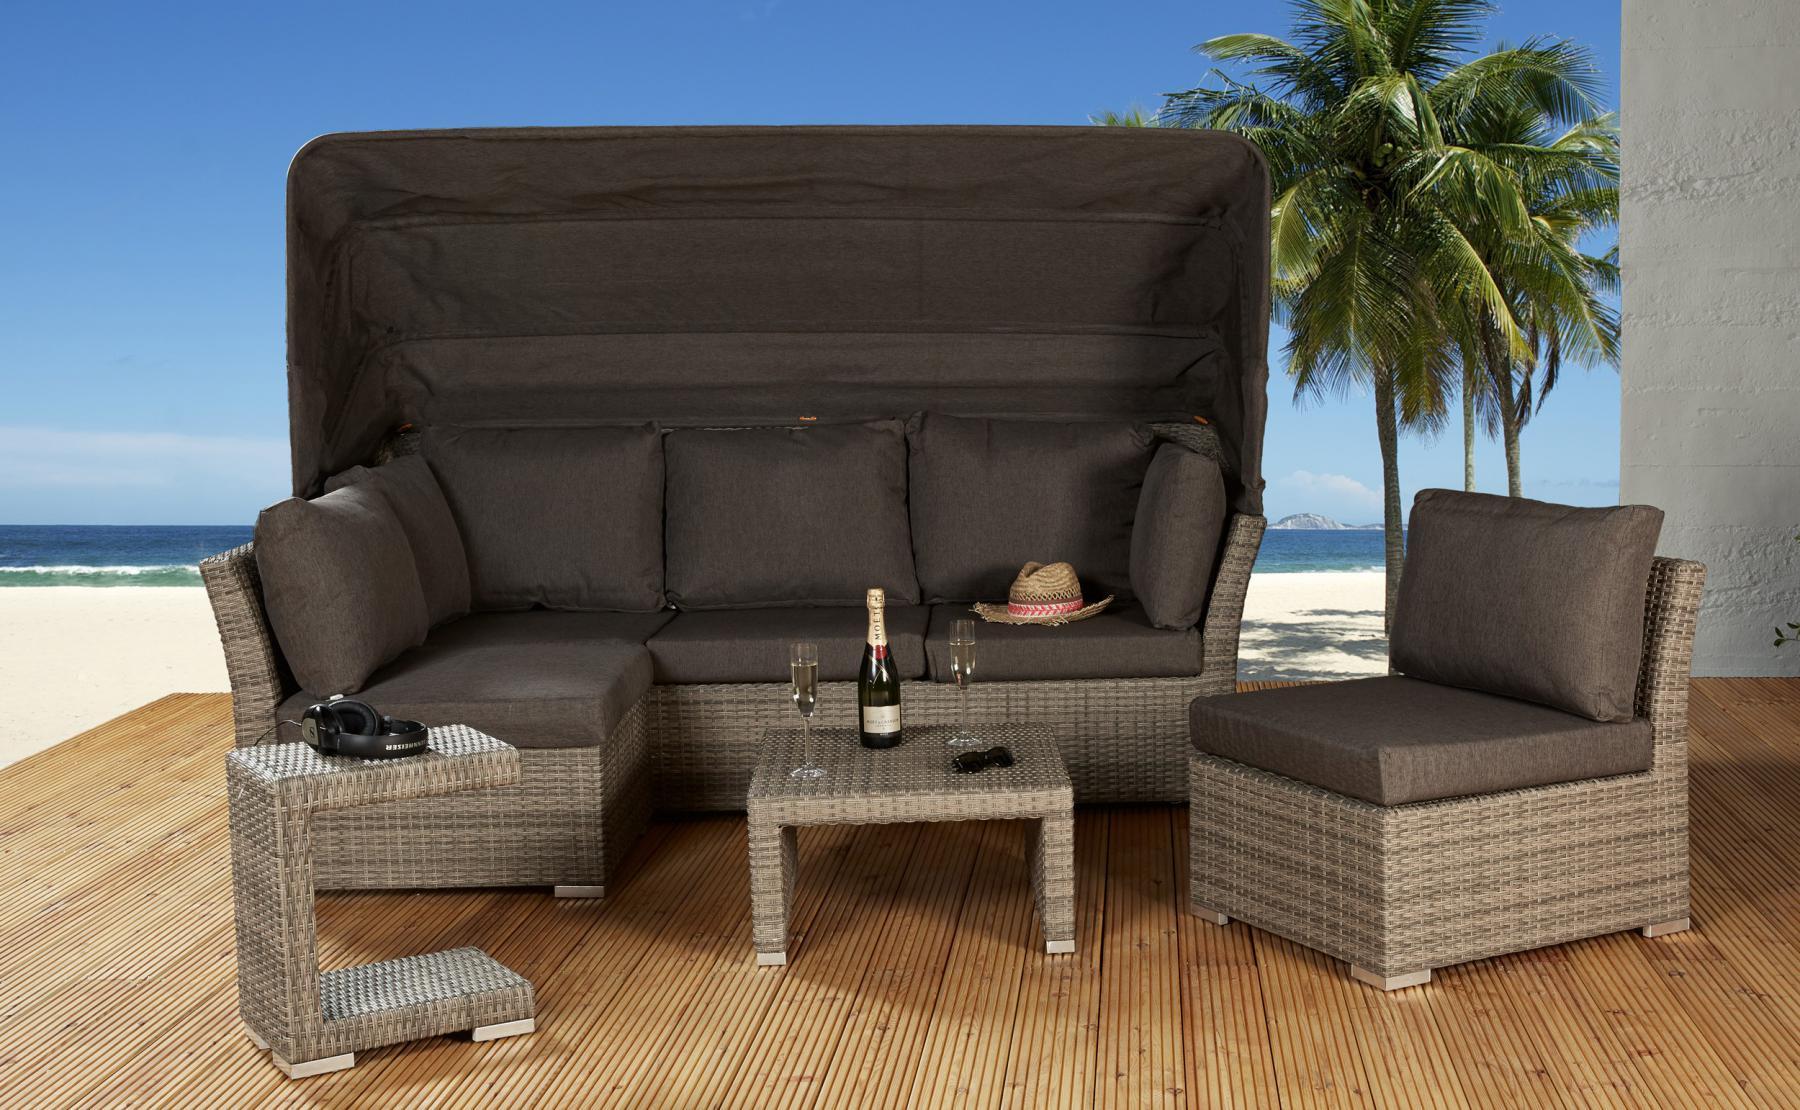 Rabida Loungegruppe Mit Dach Champagner 5 Tlg Lounge